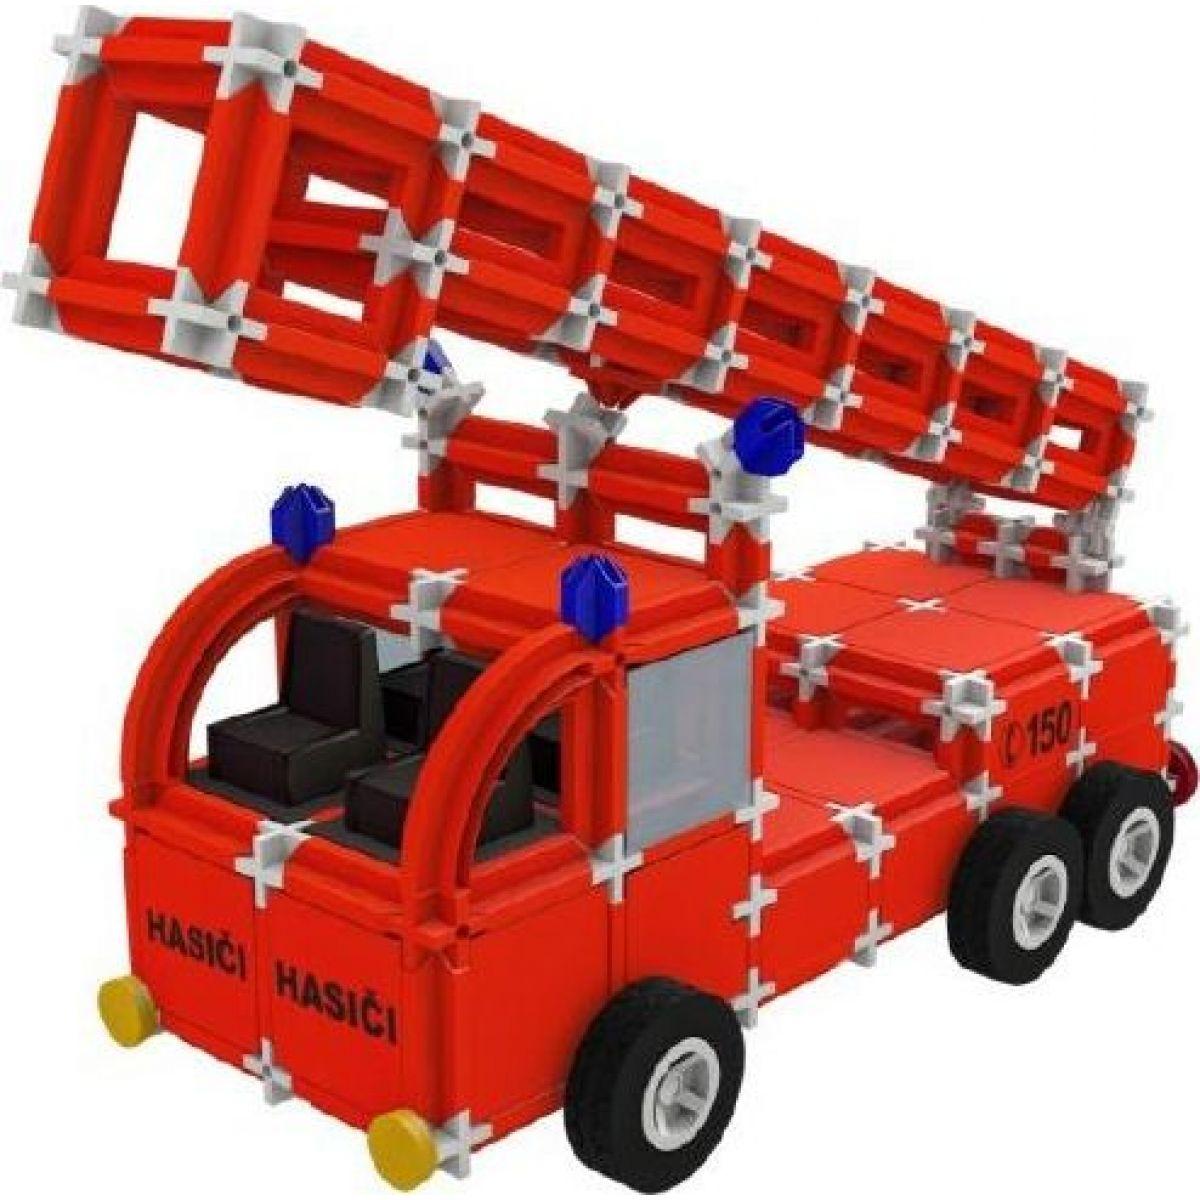 Seva Rescue 1 hasiči